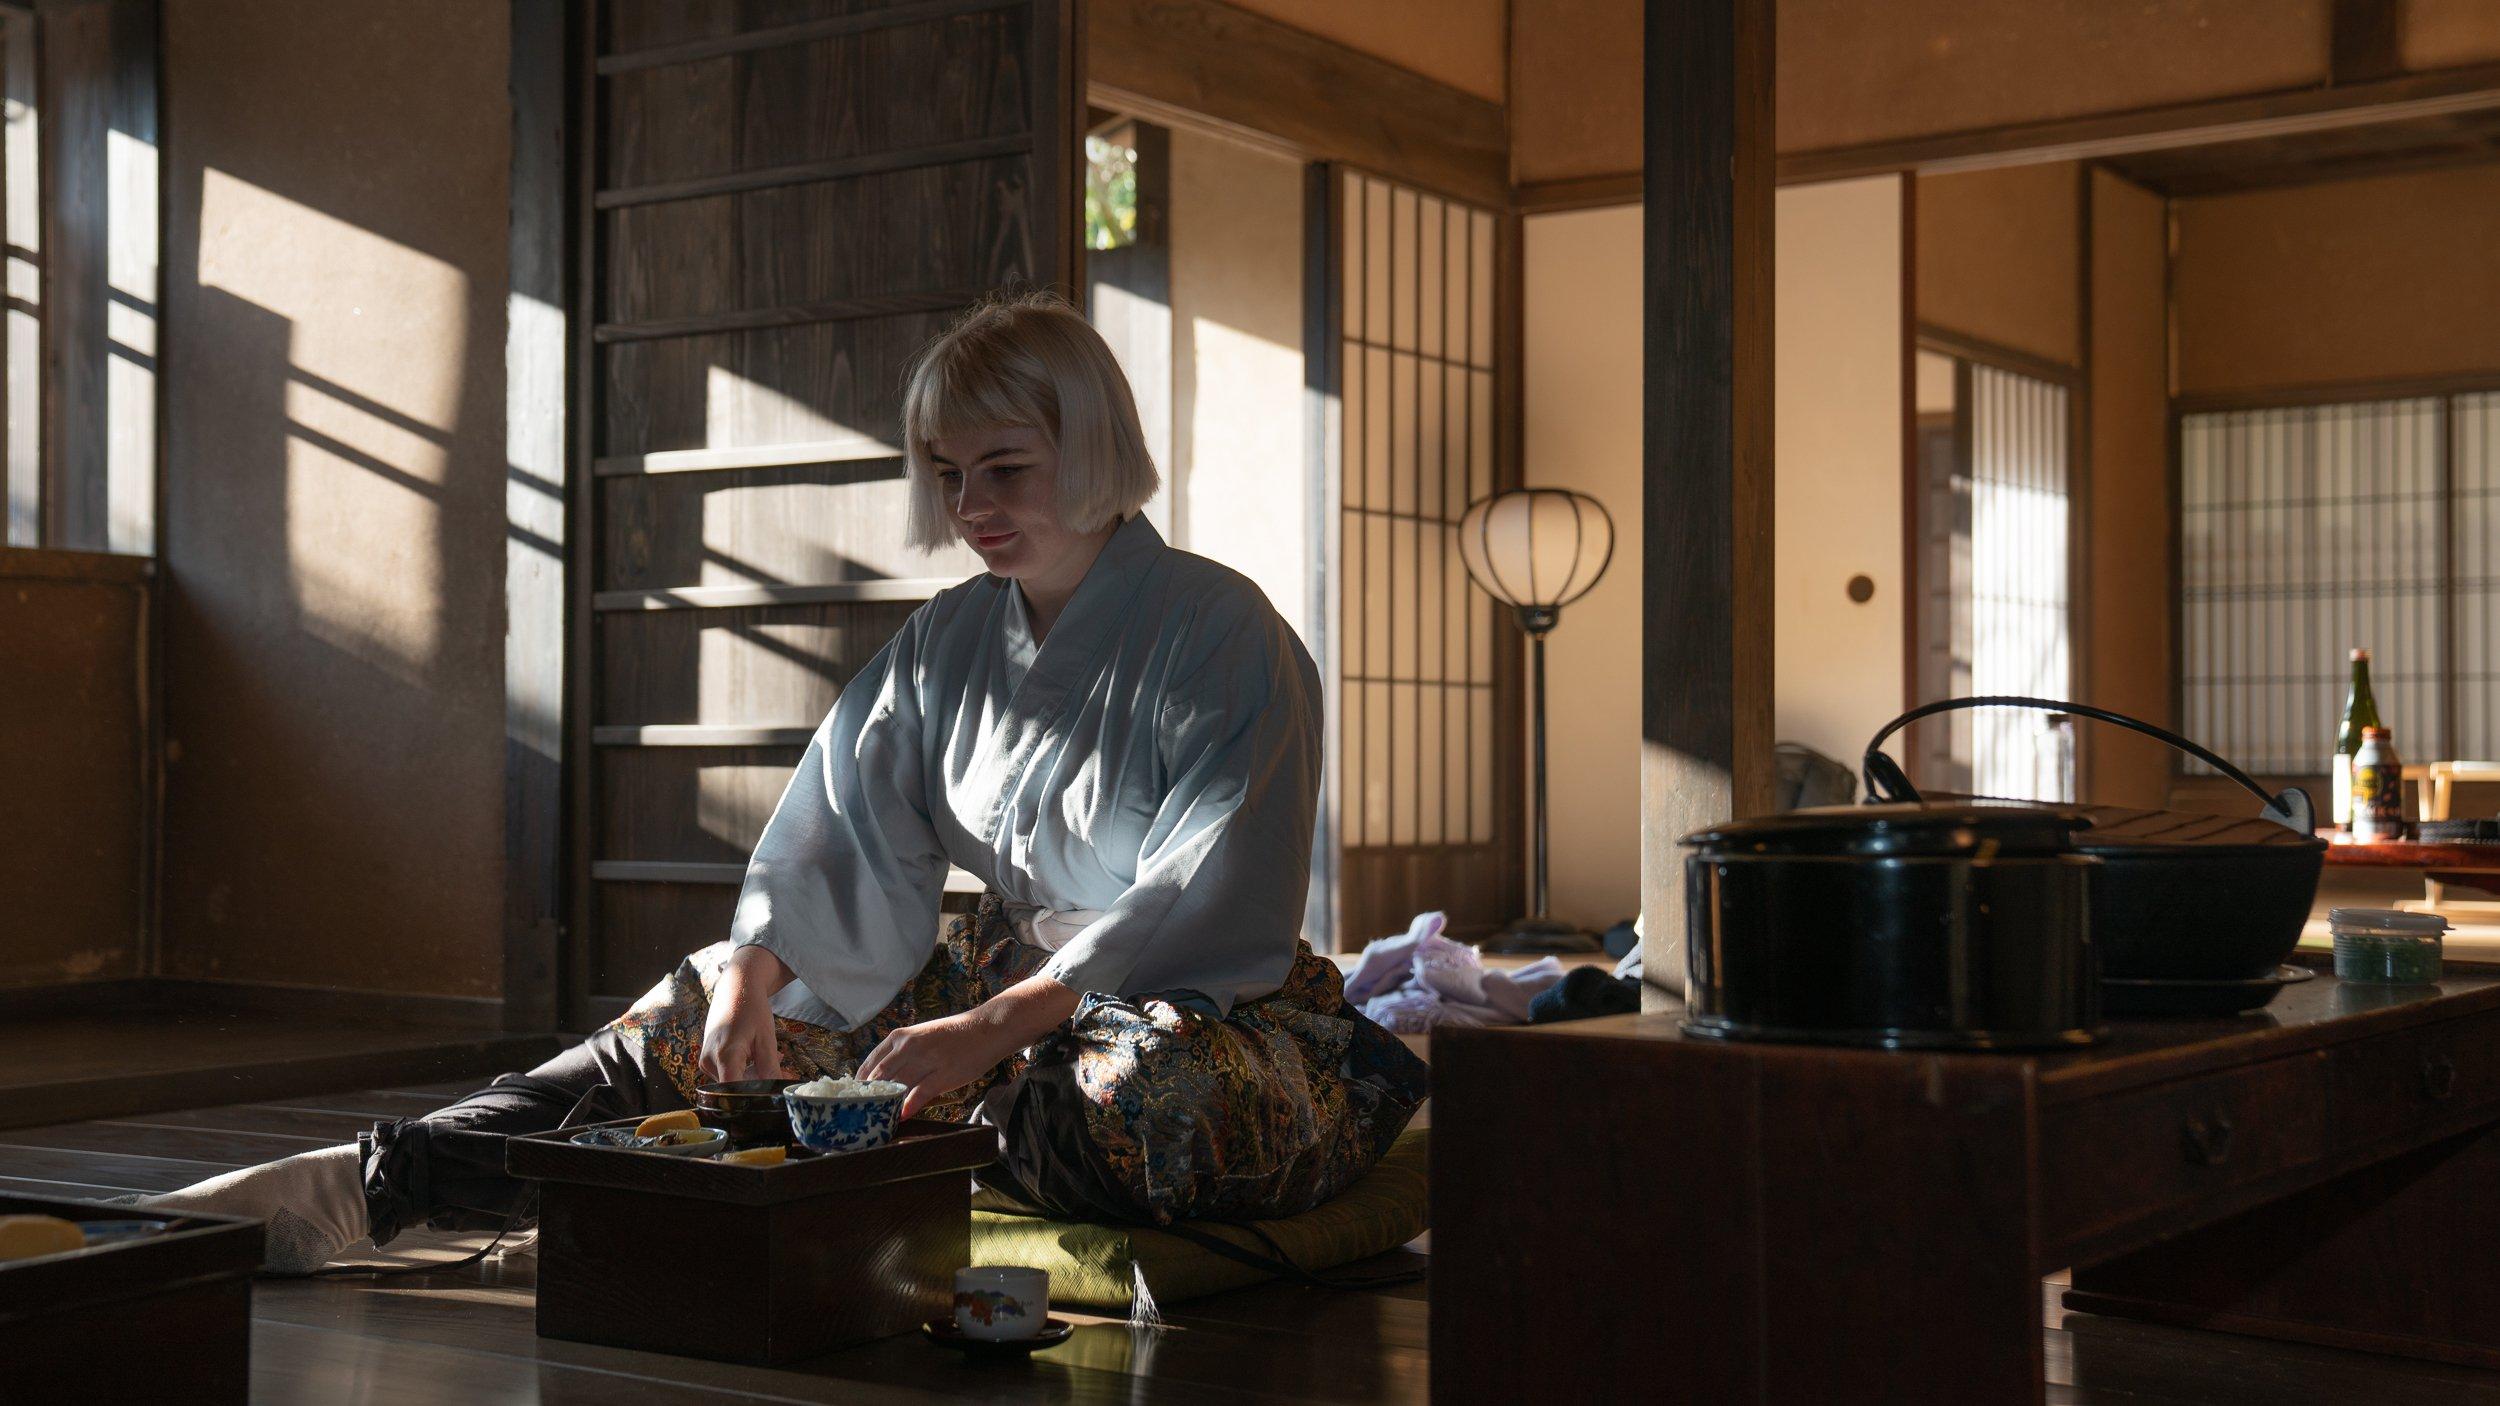 Samurai Heritage in Asakura